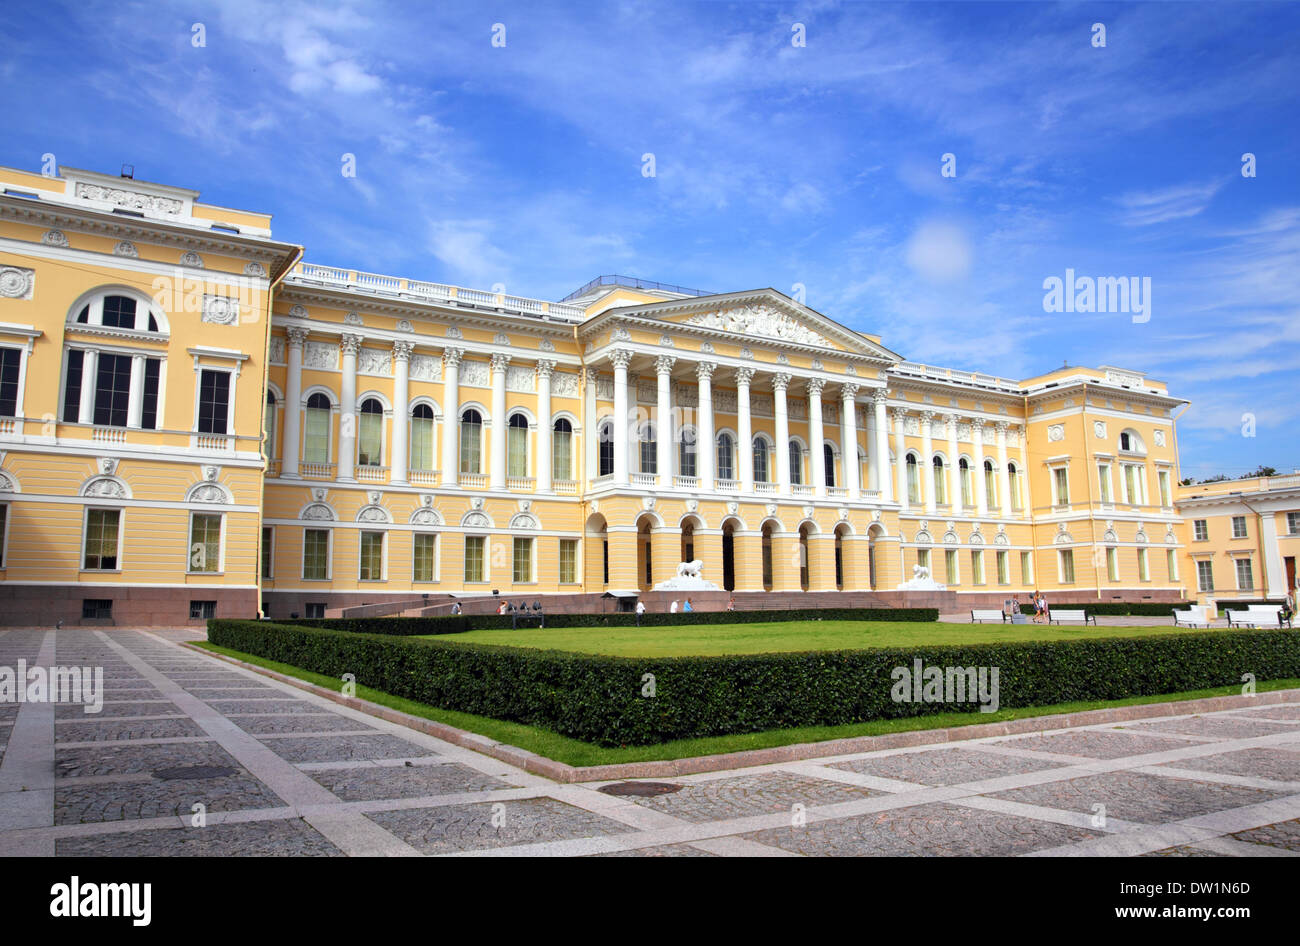 Russian museum in St. Petersburg Russia Stock Photo